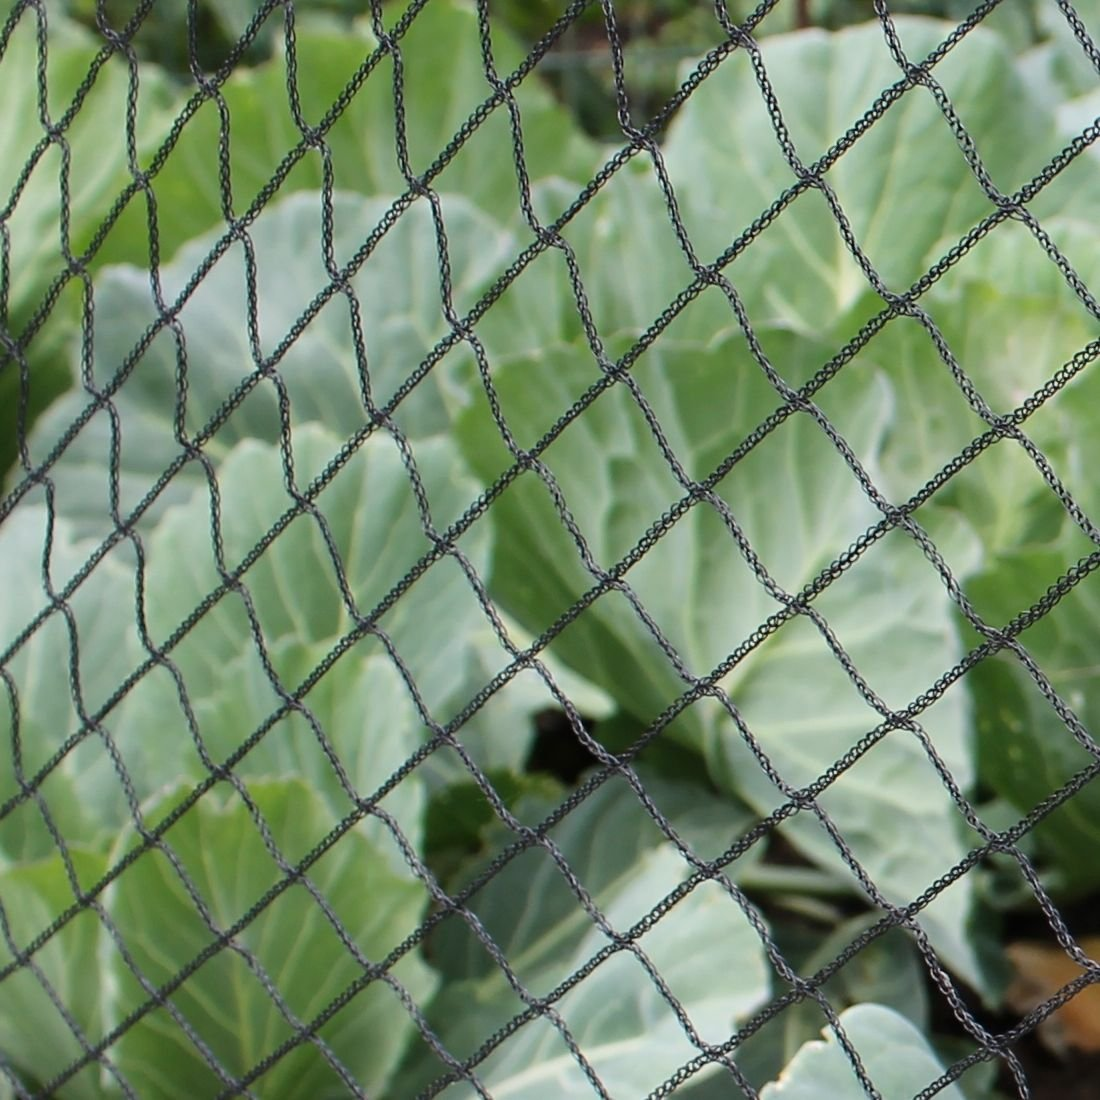 Bird Netting Garden Hoop Tunnel Kits 2.9m Long Complete with Netting